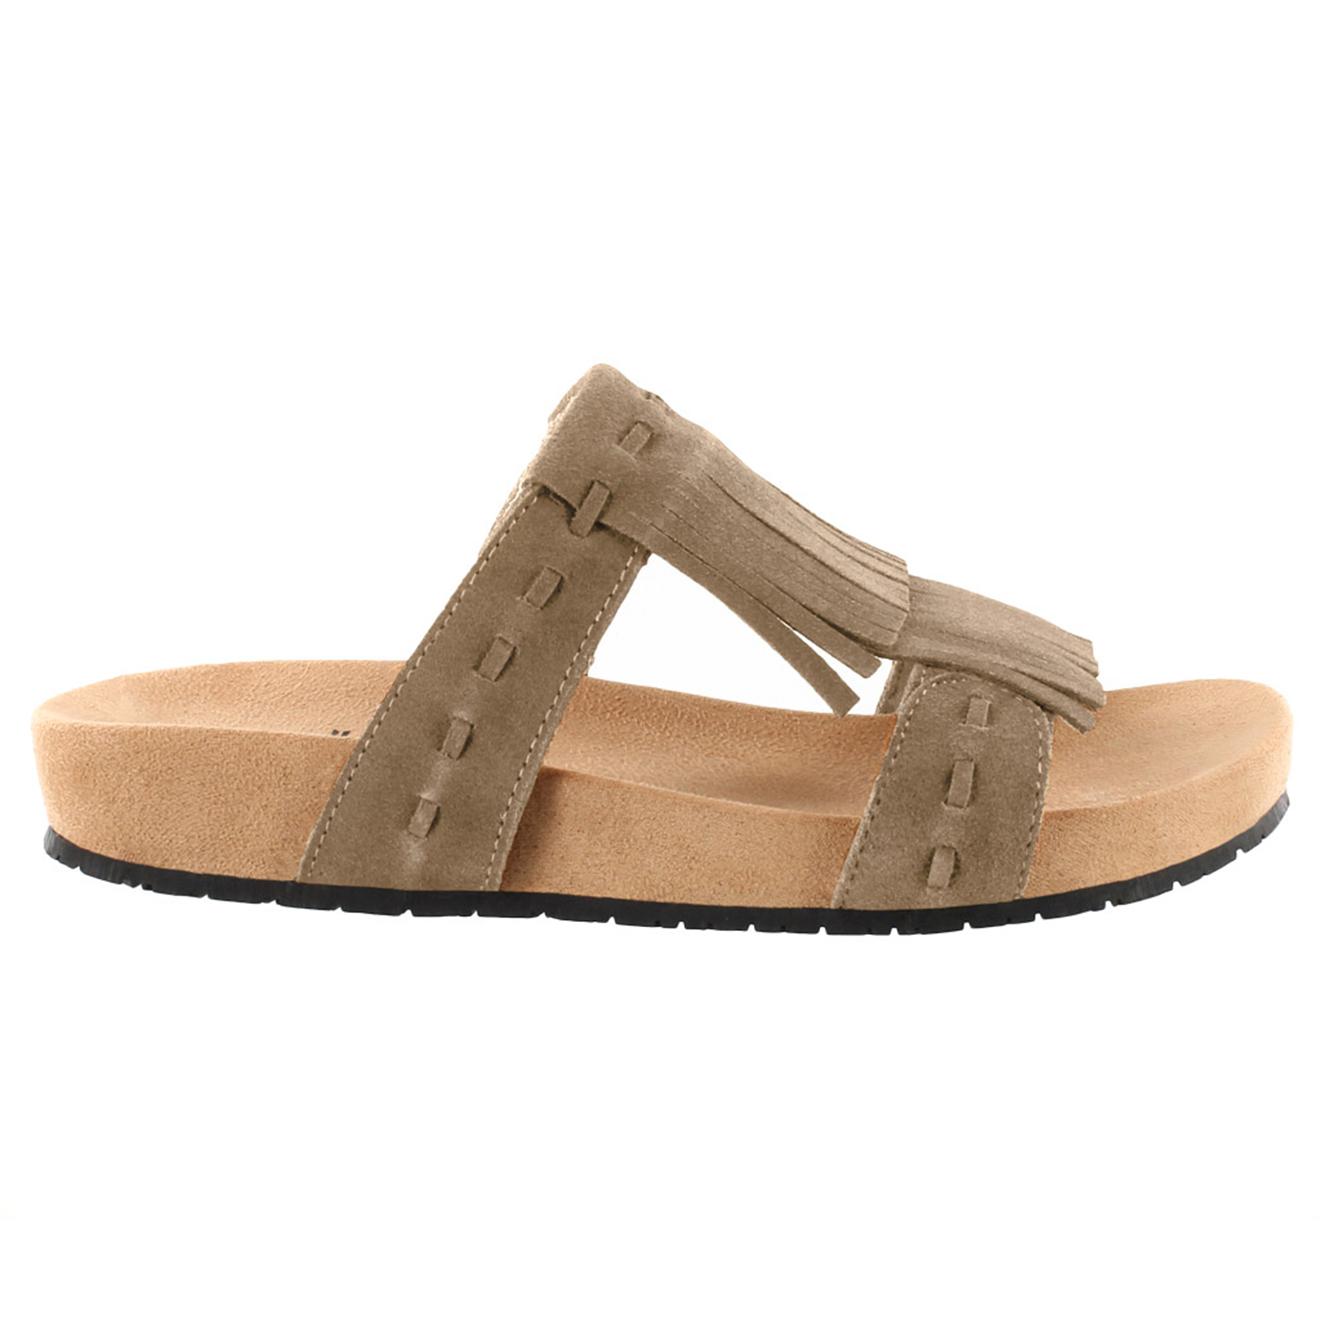 Sandales en Velours de Cuir Daisy taupe - Minnetonka - Modalova